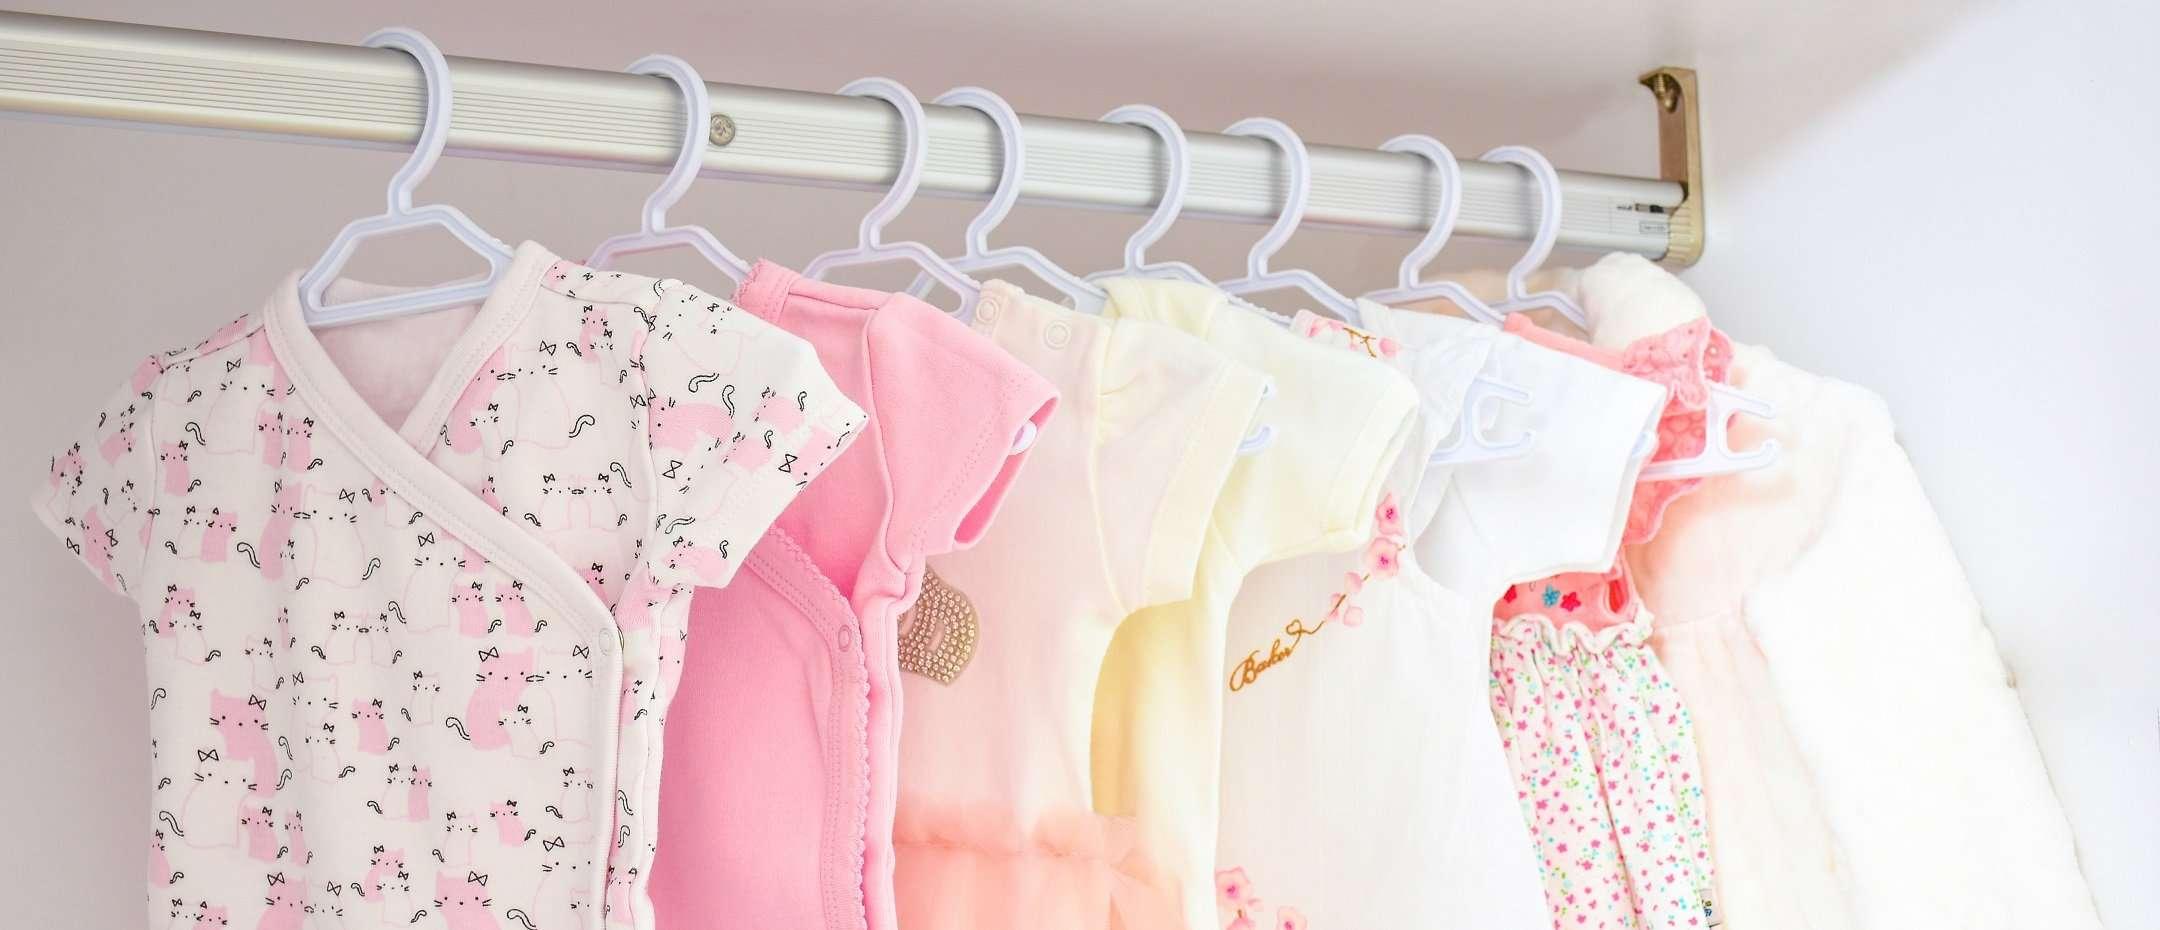 5 Baby Closet Organization Ideas